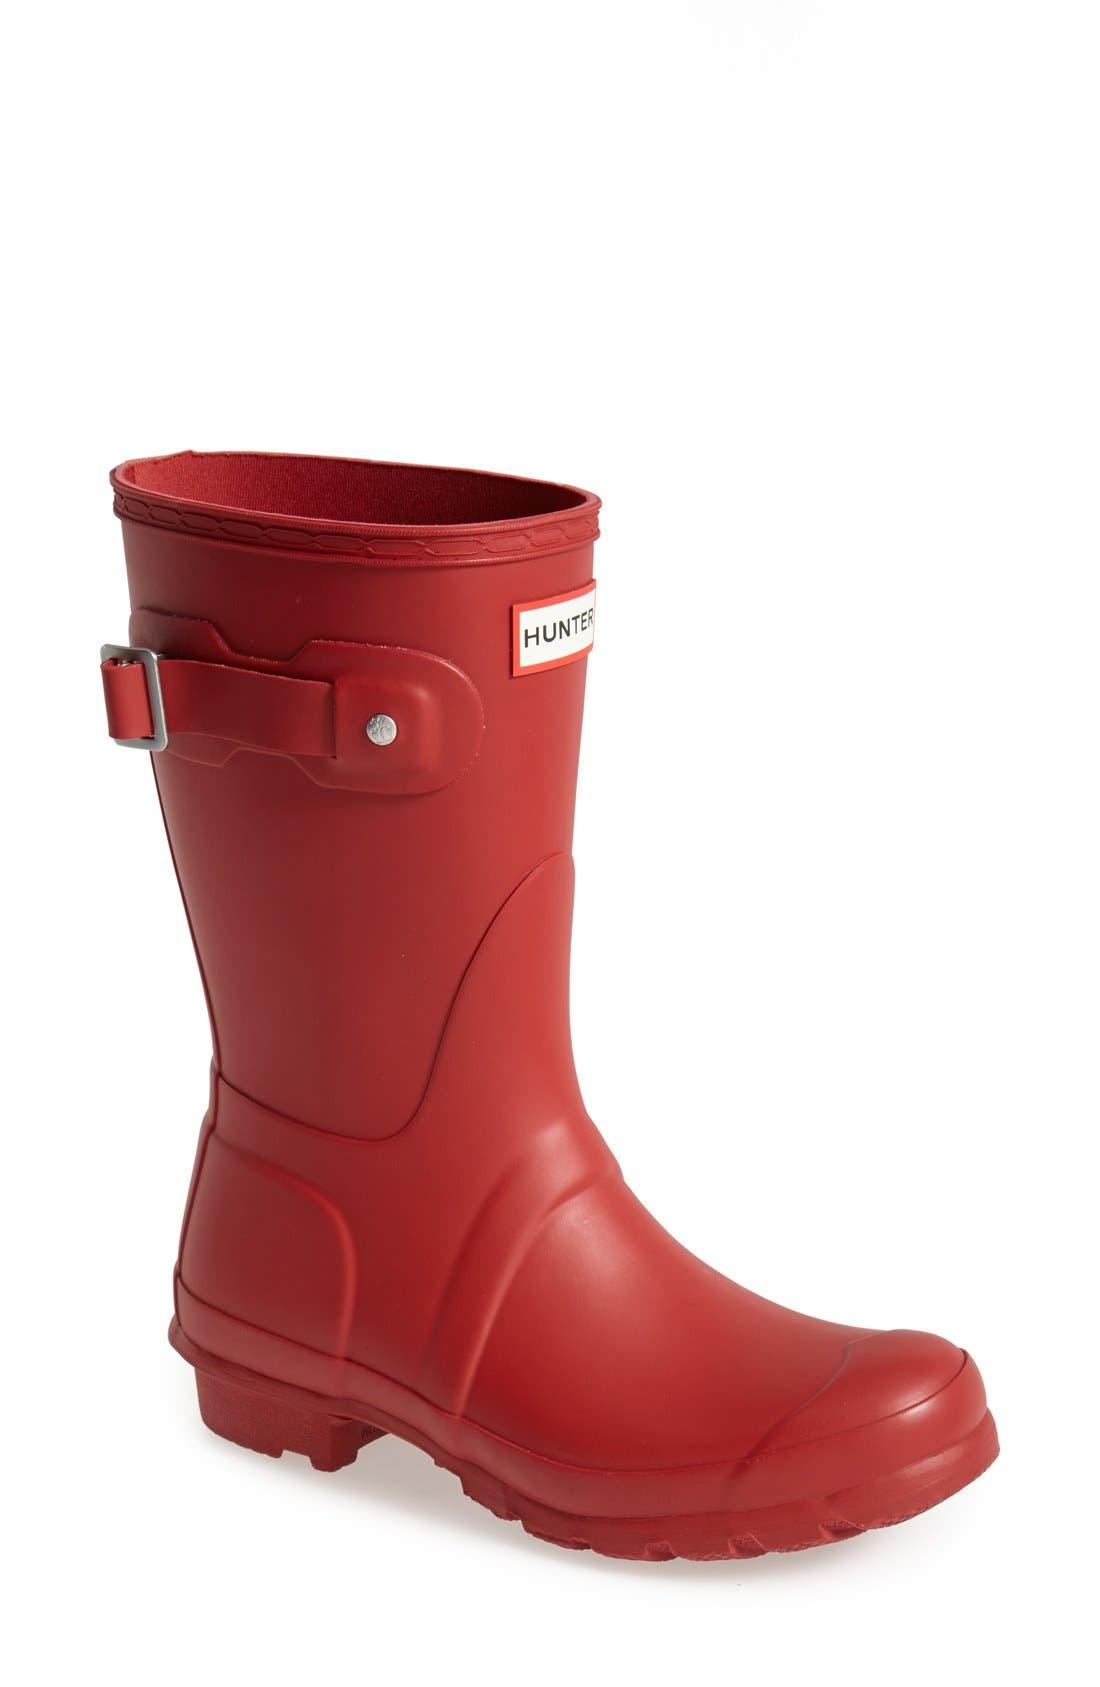 Main Image - Hunter 'Original Short' Rain Boot (Women)